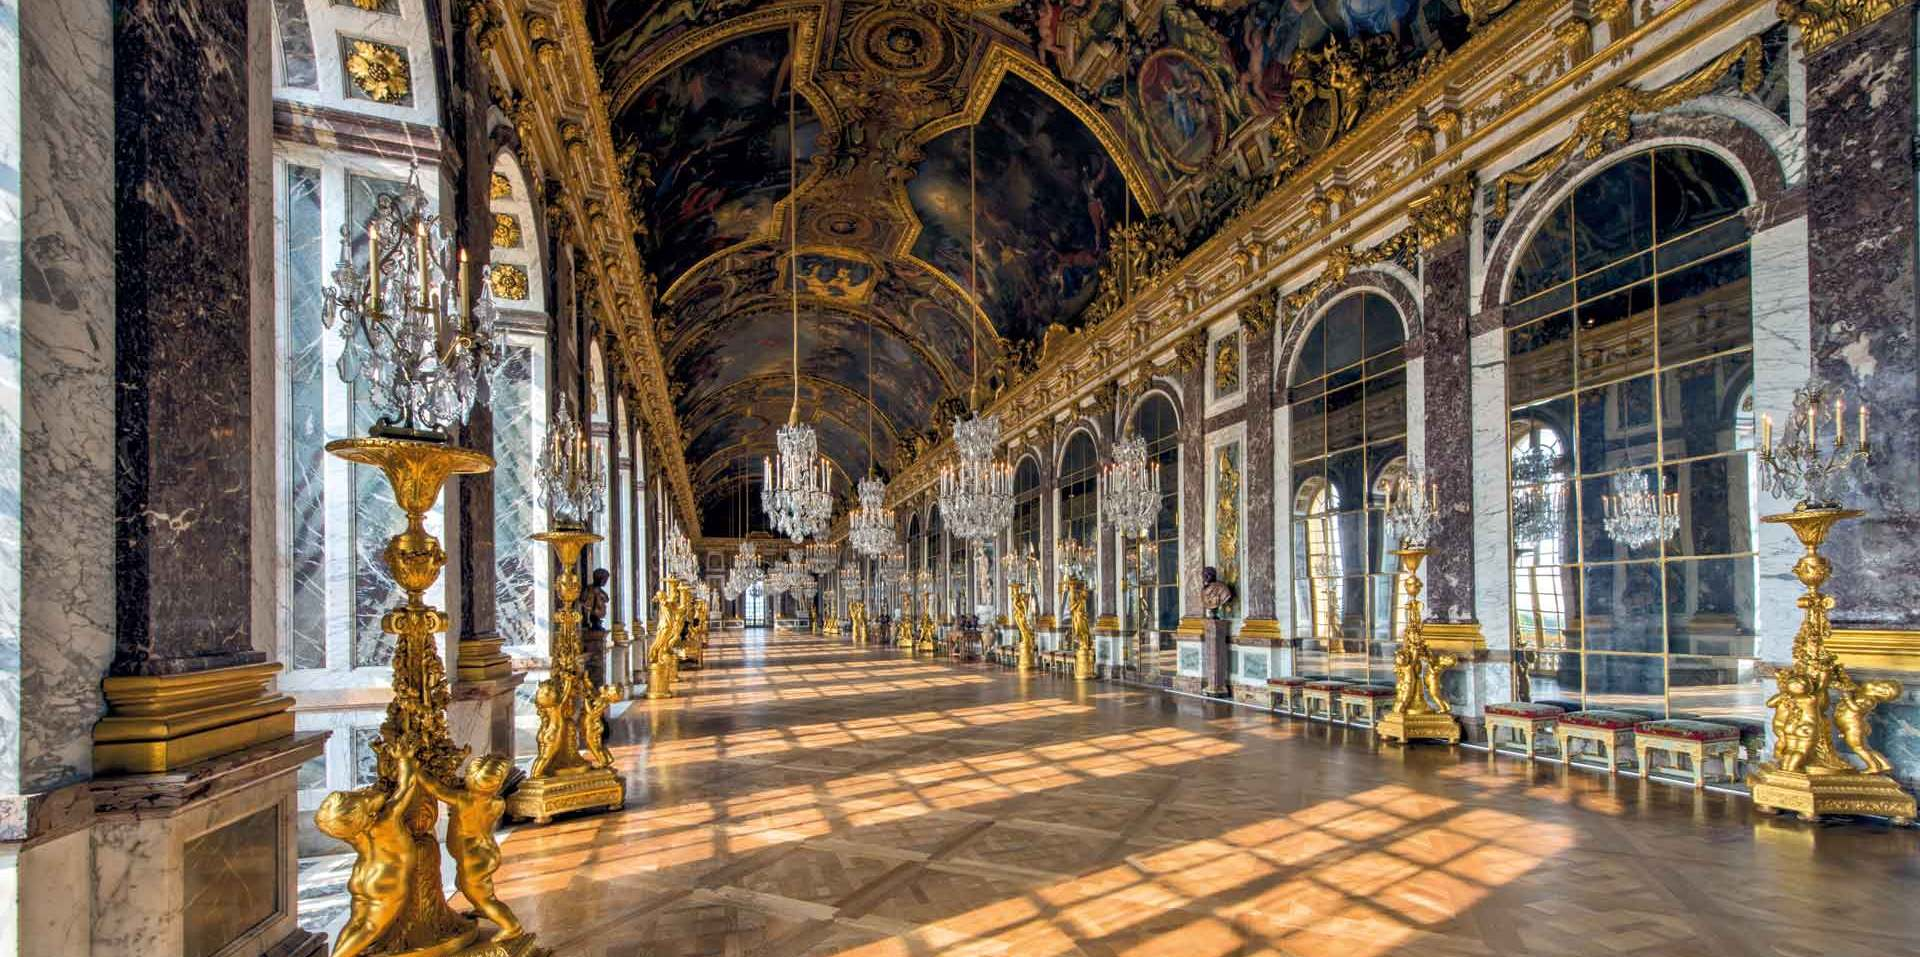 http://styleinsider.com.ua/wp-content/uploads/2019/03/chateau_lieu_galerieGlaces_20170315111146.jpg